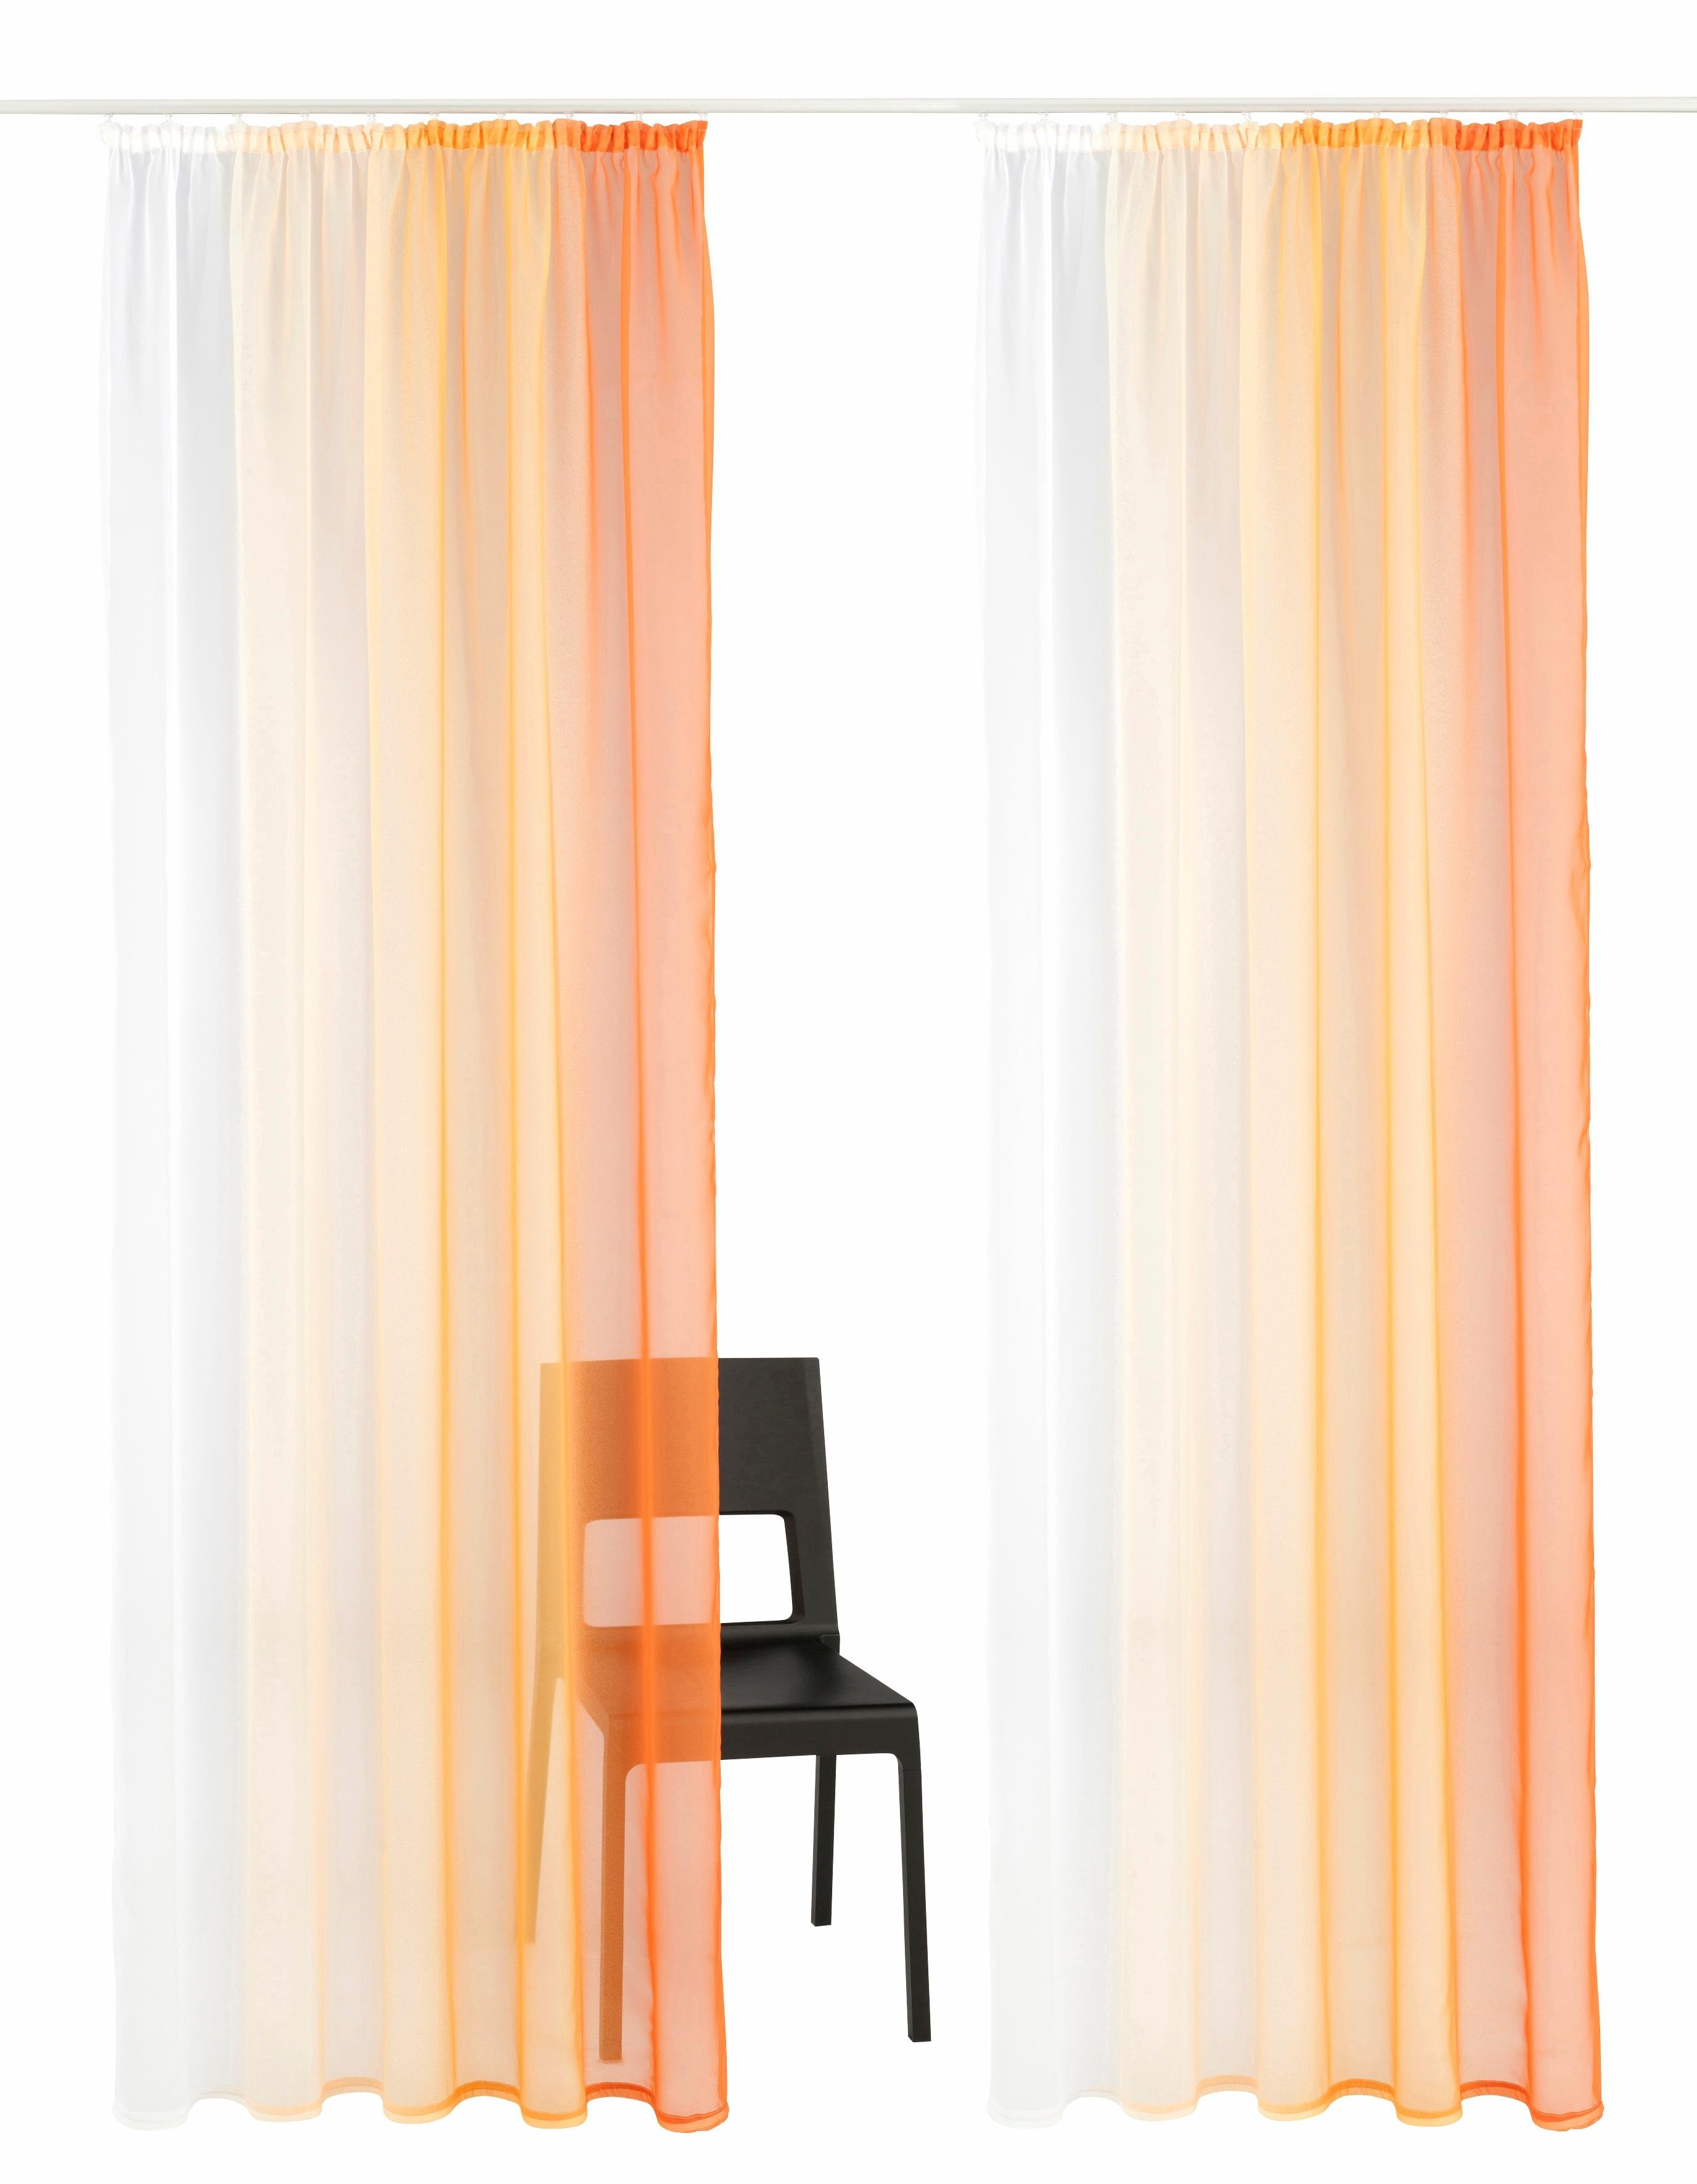 https://i.otto.nl/i/otto/20366909/gordijn-my-home-valverde-met-rimpelband-set-van-2-oranje.jpg?$ovnl_seo_index$